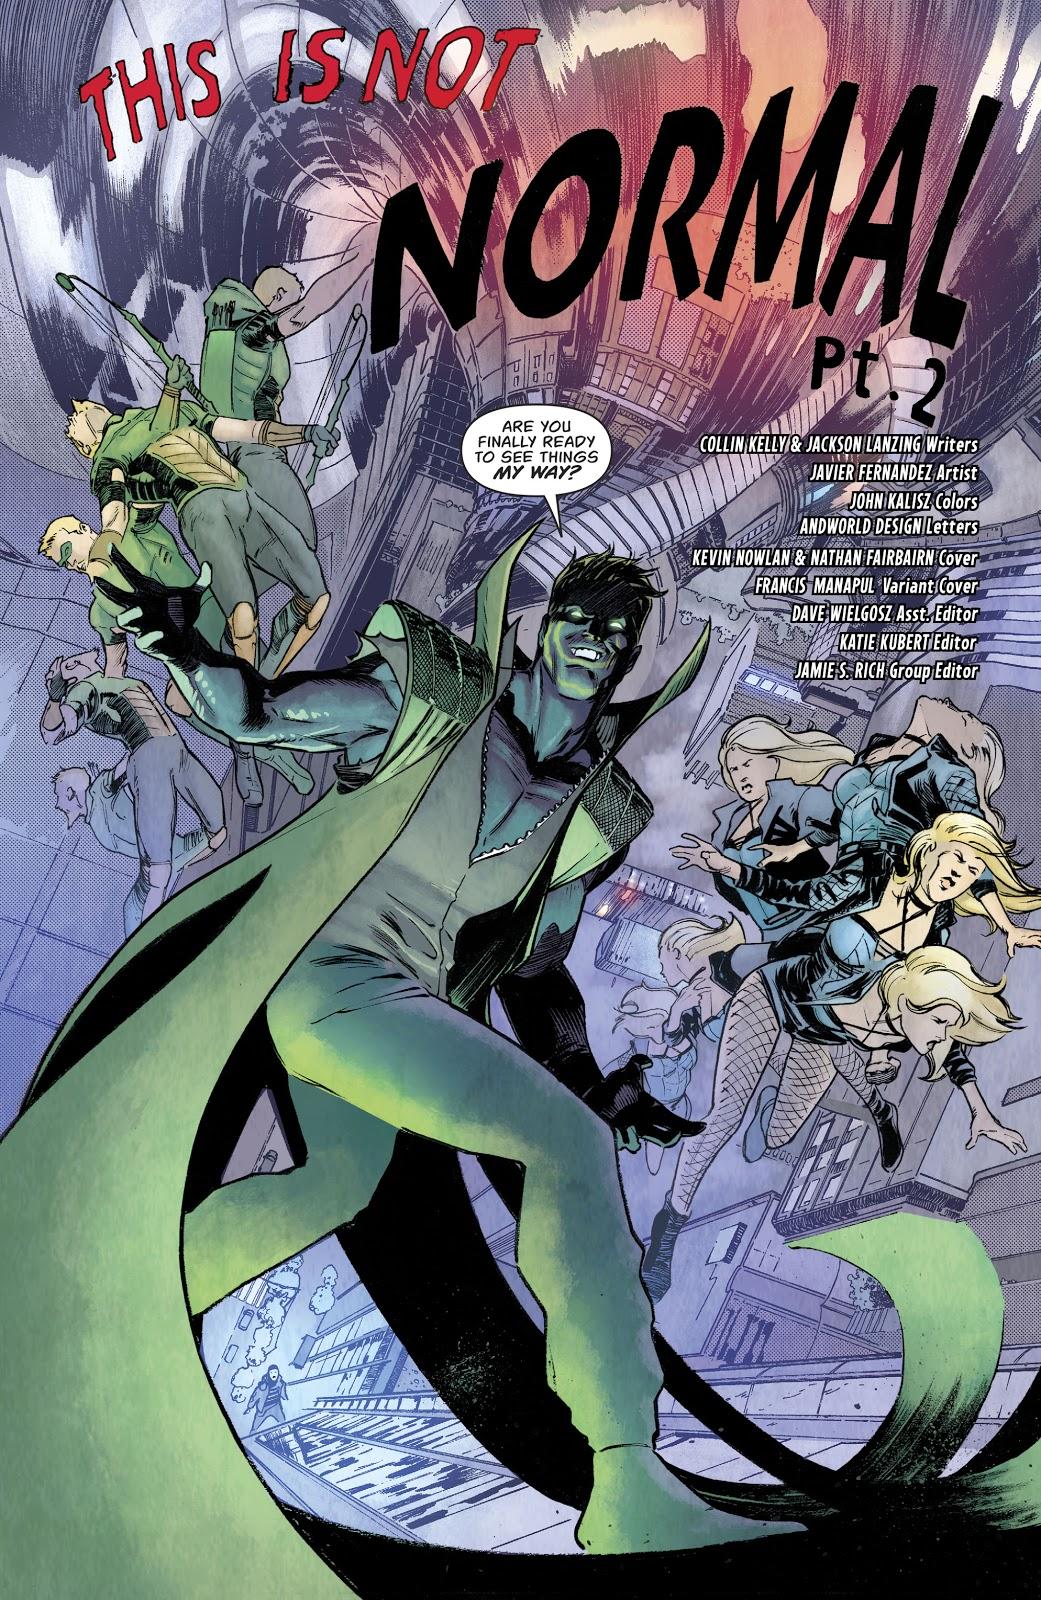 Count Vertigo (Green Arrow Vol. 6 #49)